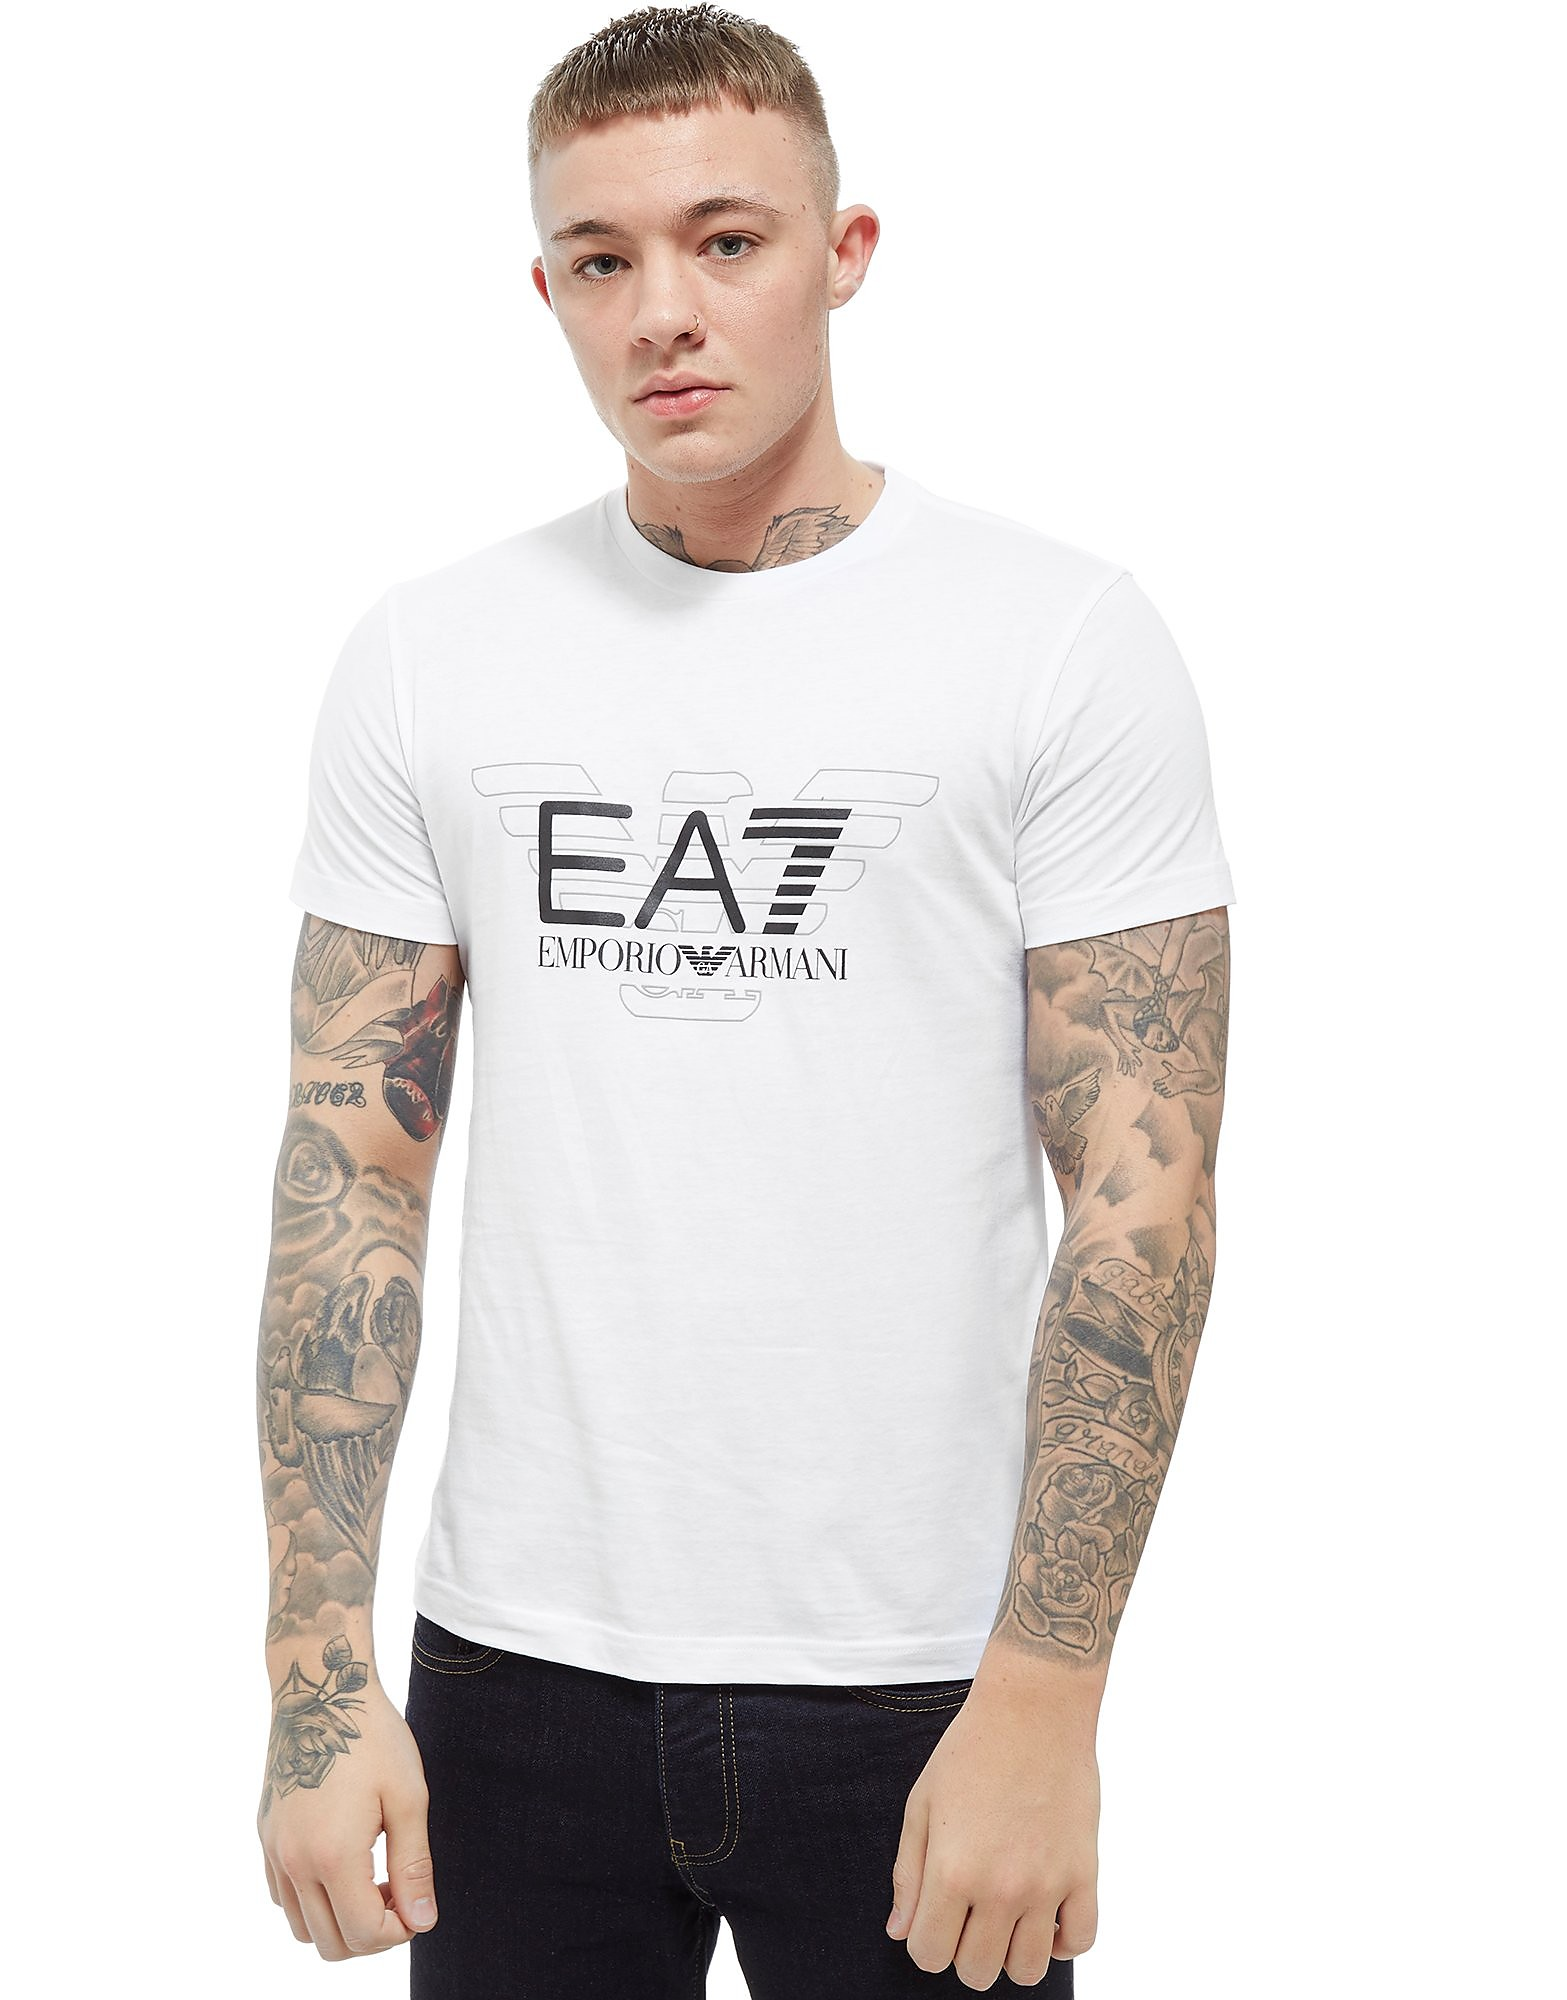 Emporio Armani EA7 Overlay Eagle Short Sleeve T-Shirt Heren